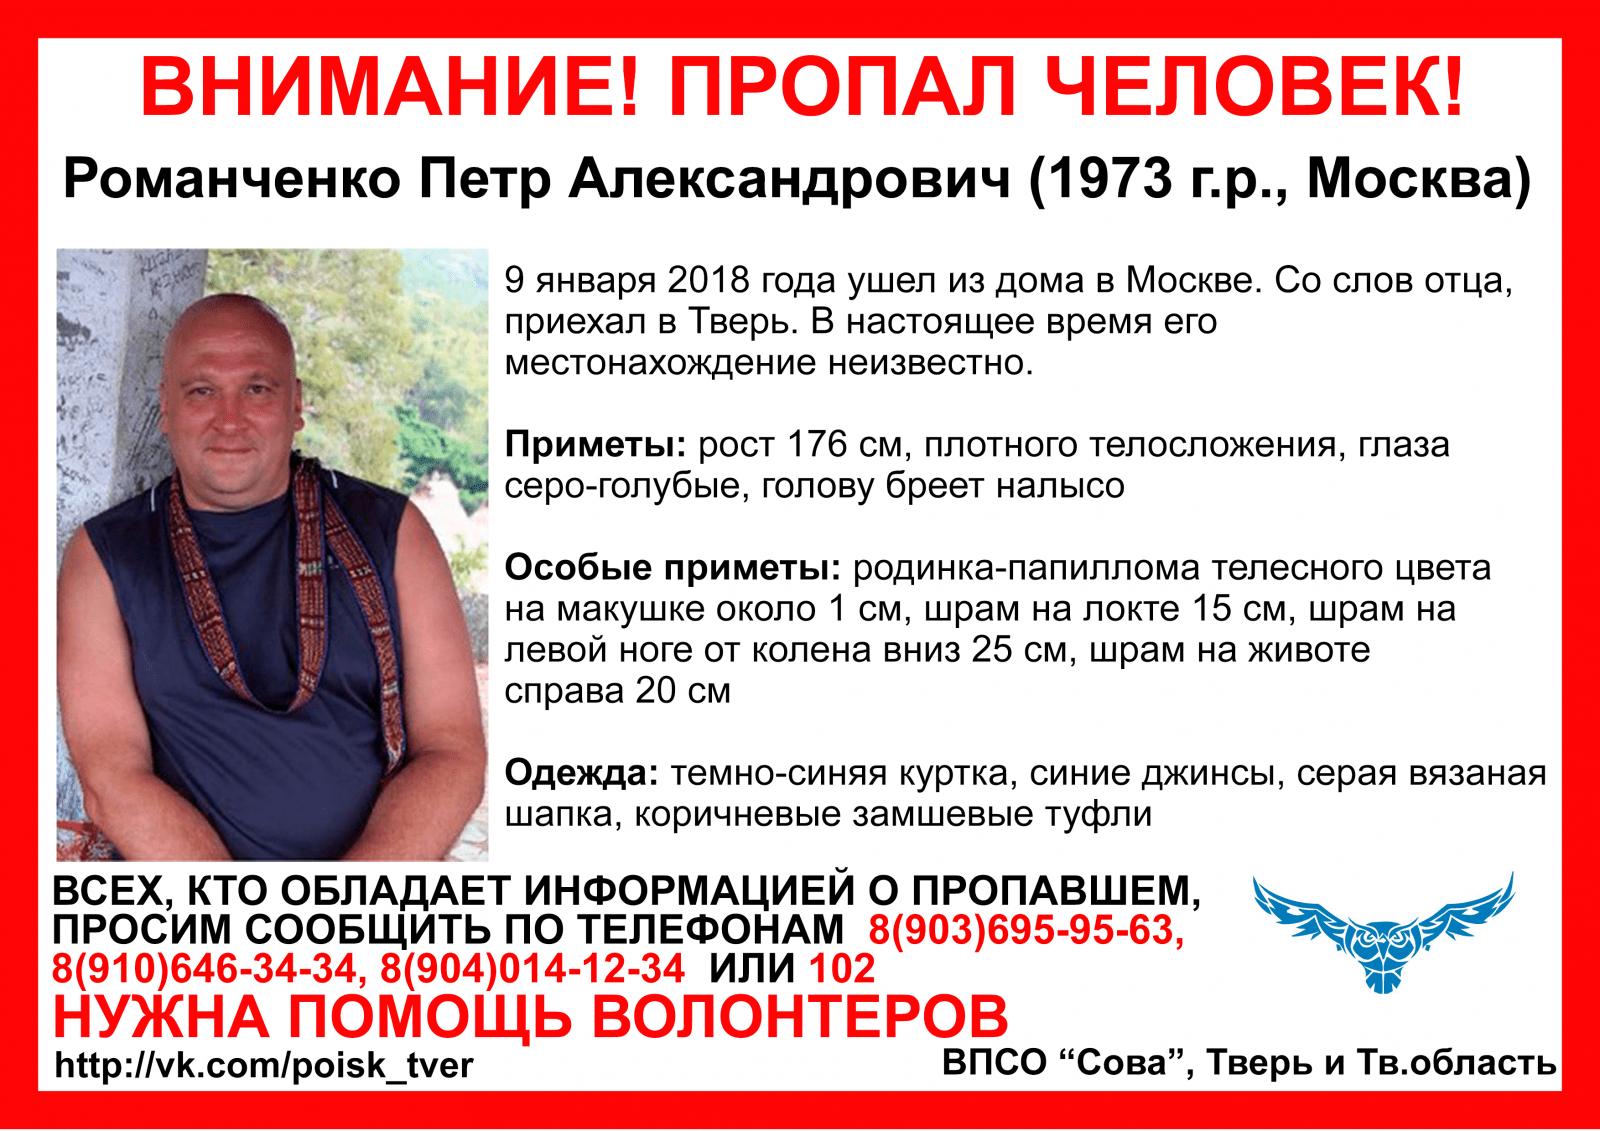 Пропал Романченко Петр Александрович (1973 г.р.)